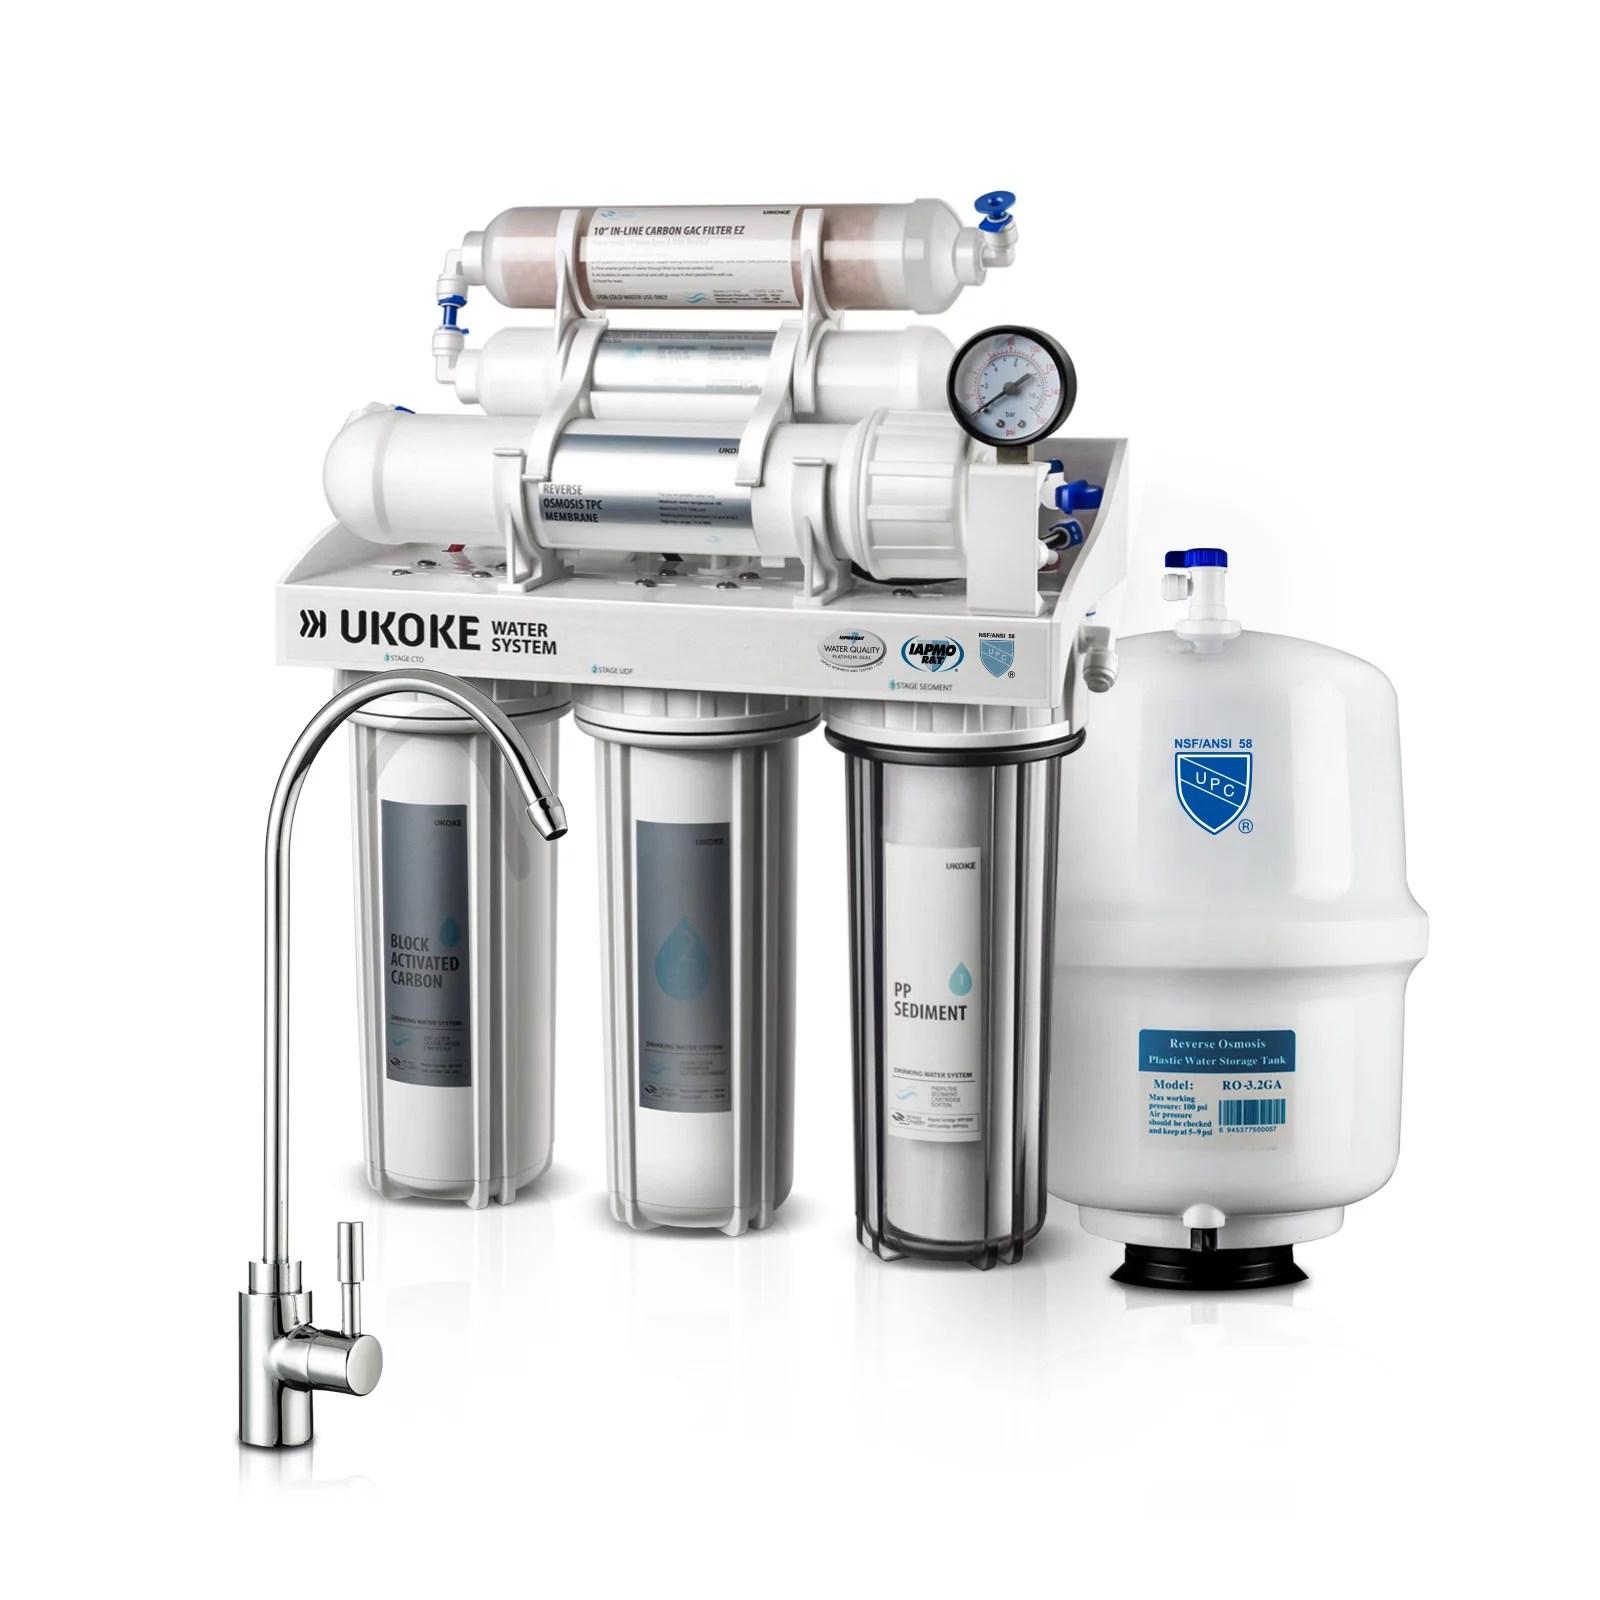 Ukoke 6 Stages Reverse Osmosis Water Filtration System 75 Gpd Walmart Com Walmart Com